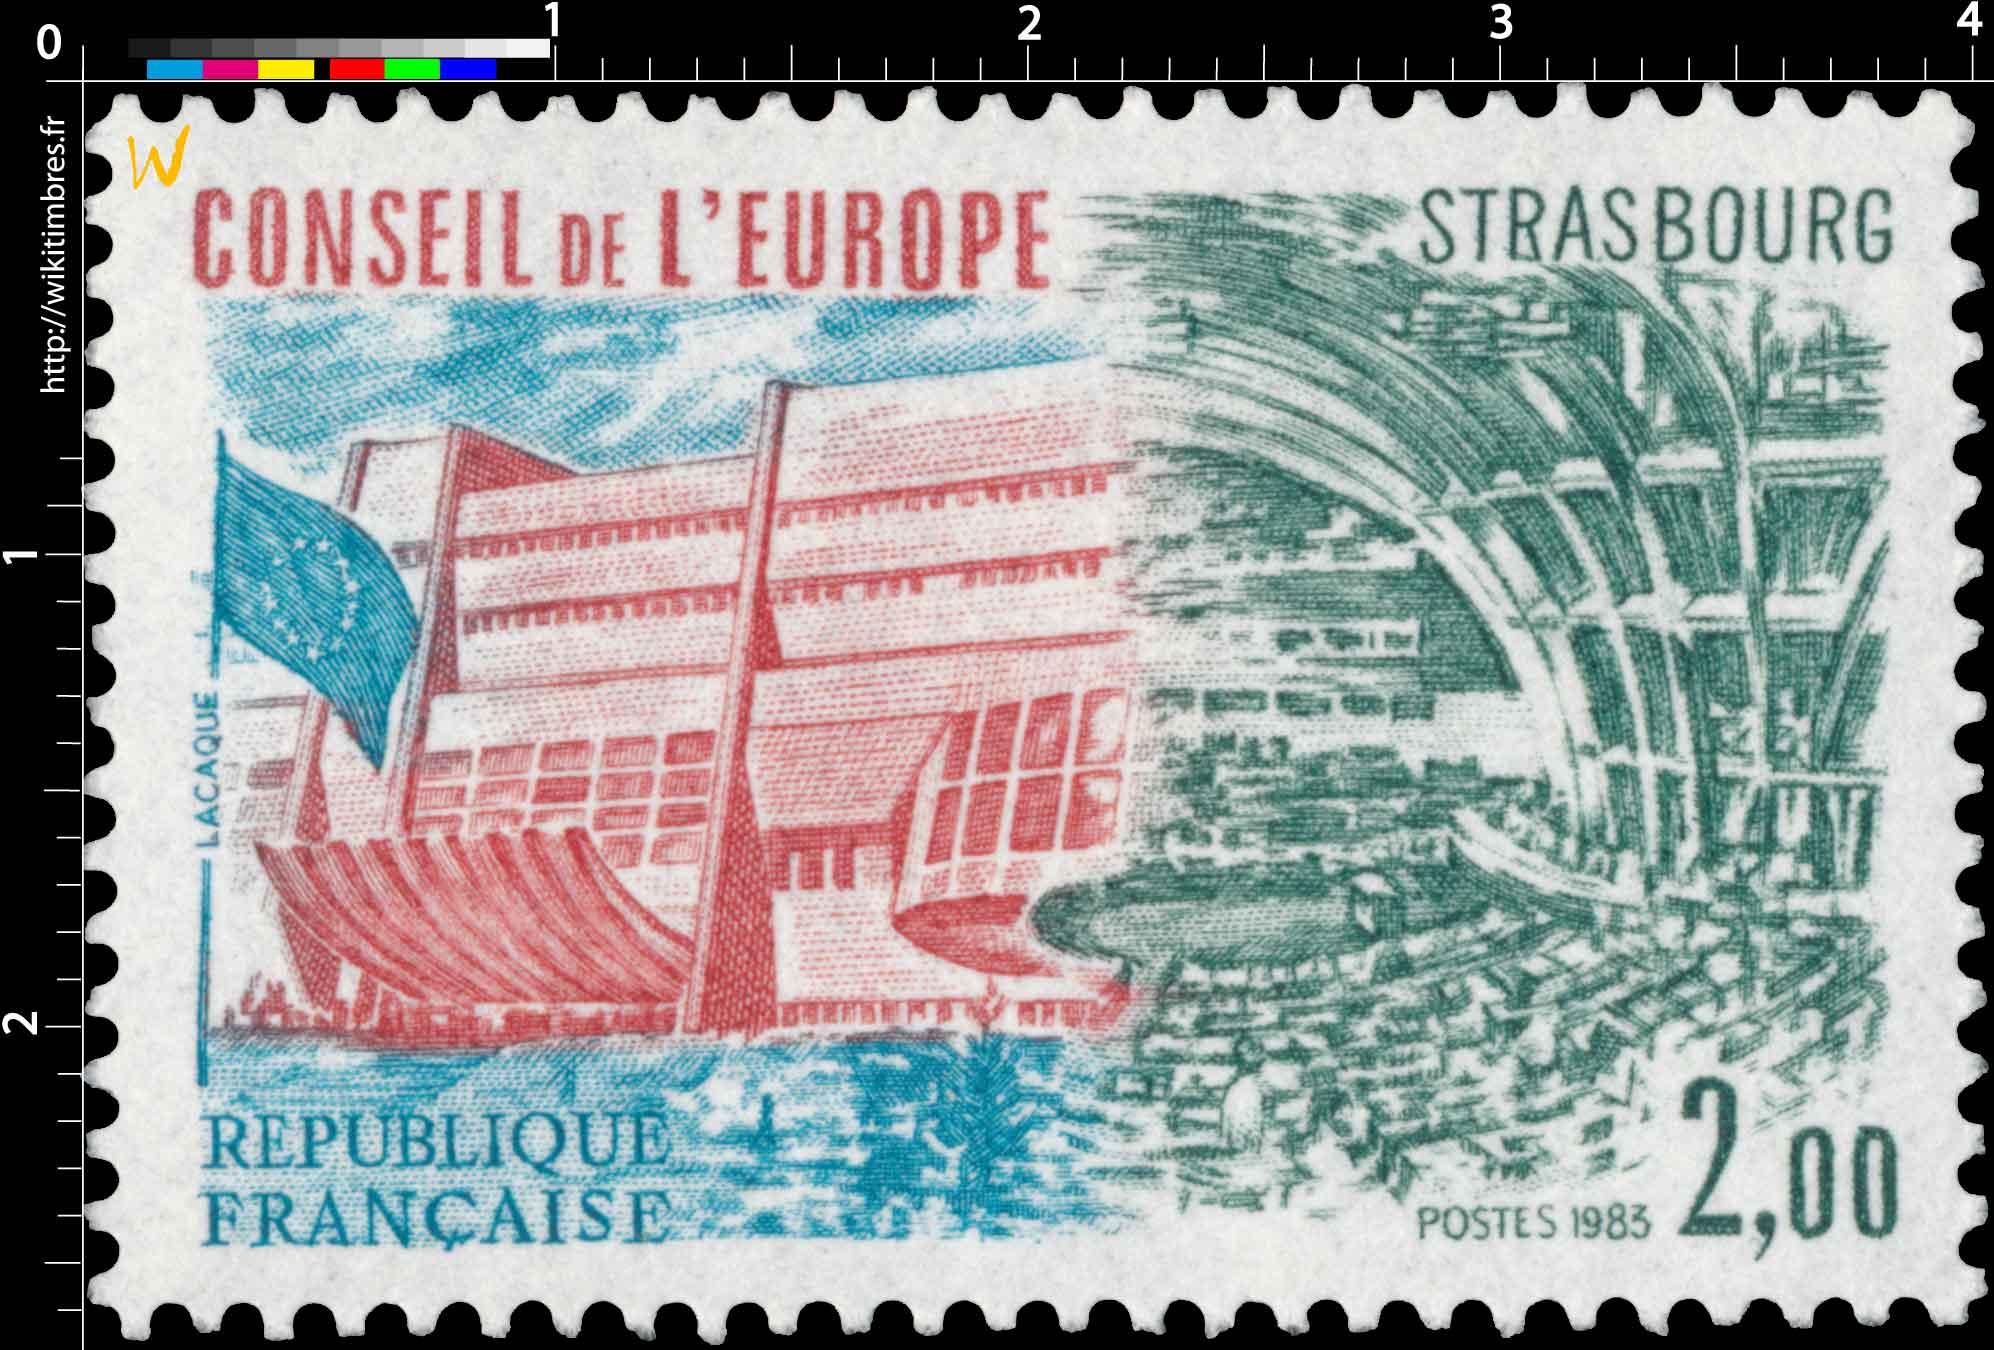 1983 CONSEIL DE L'EUROPE STRASBOURG